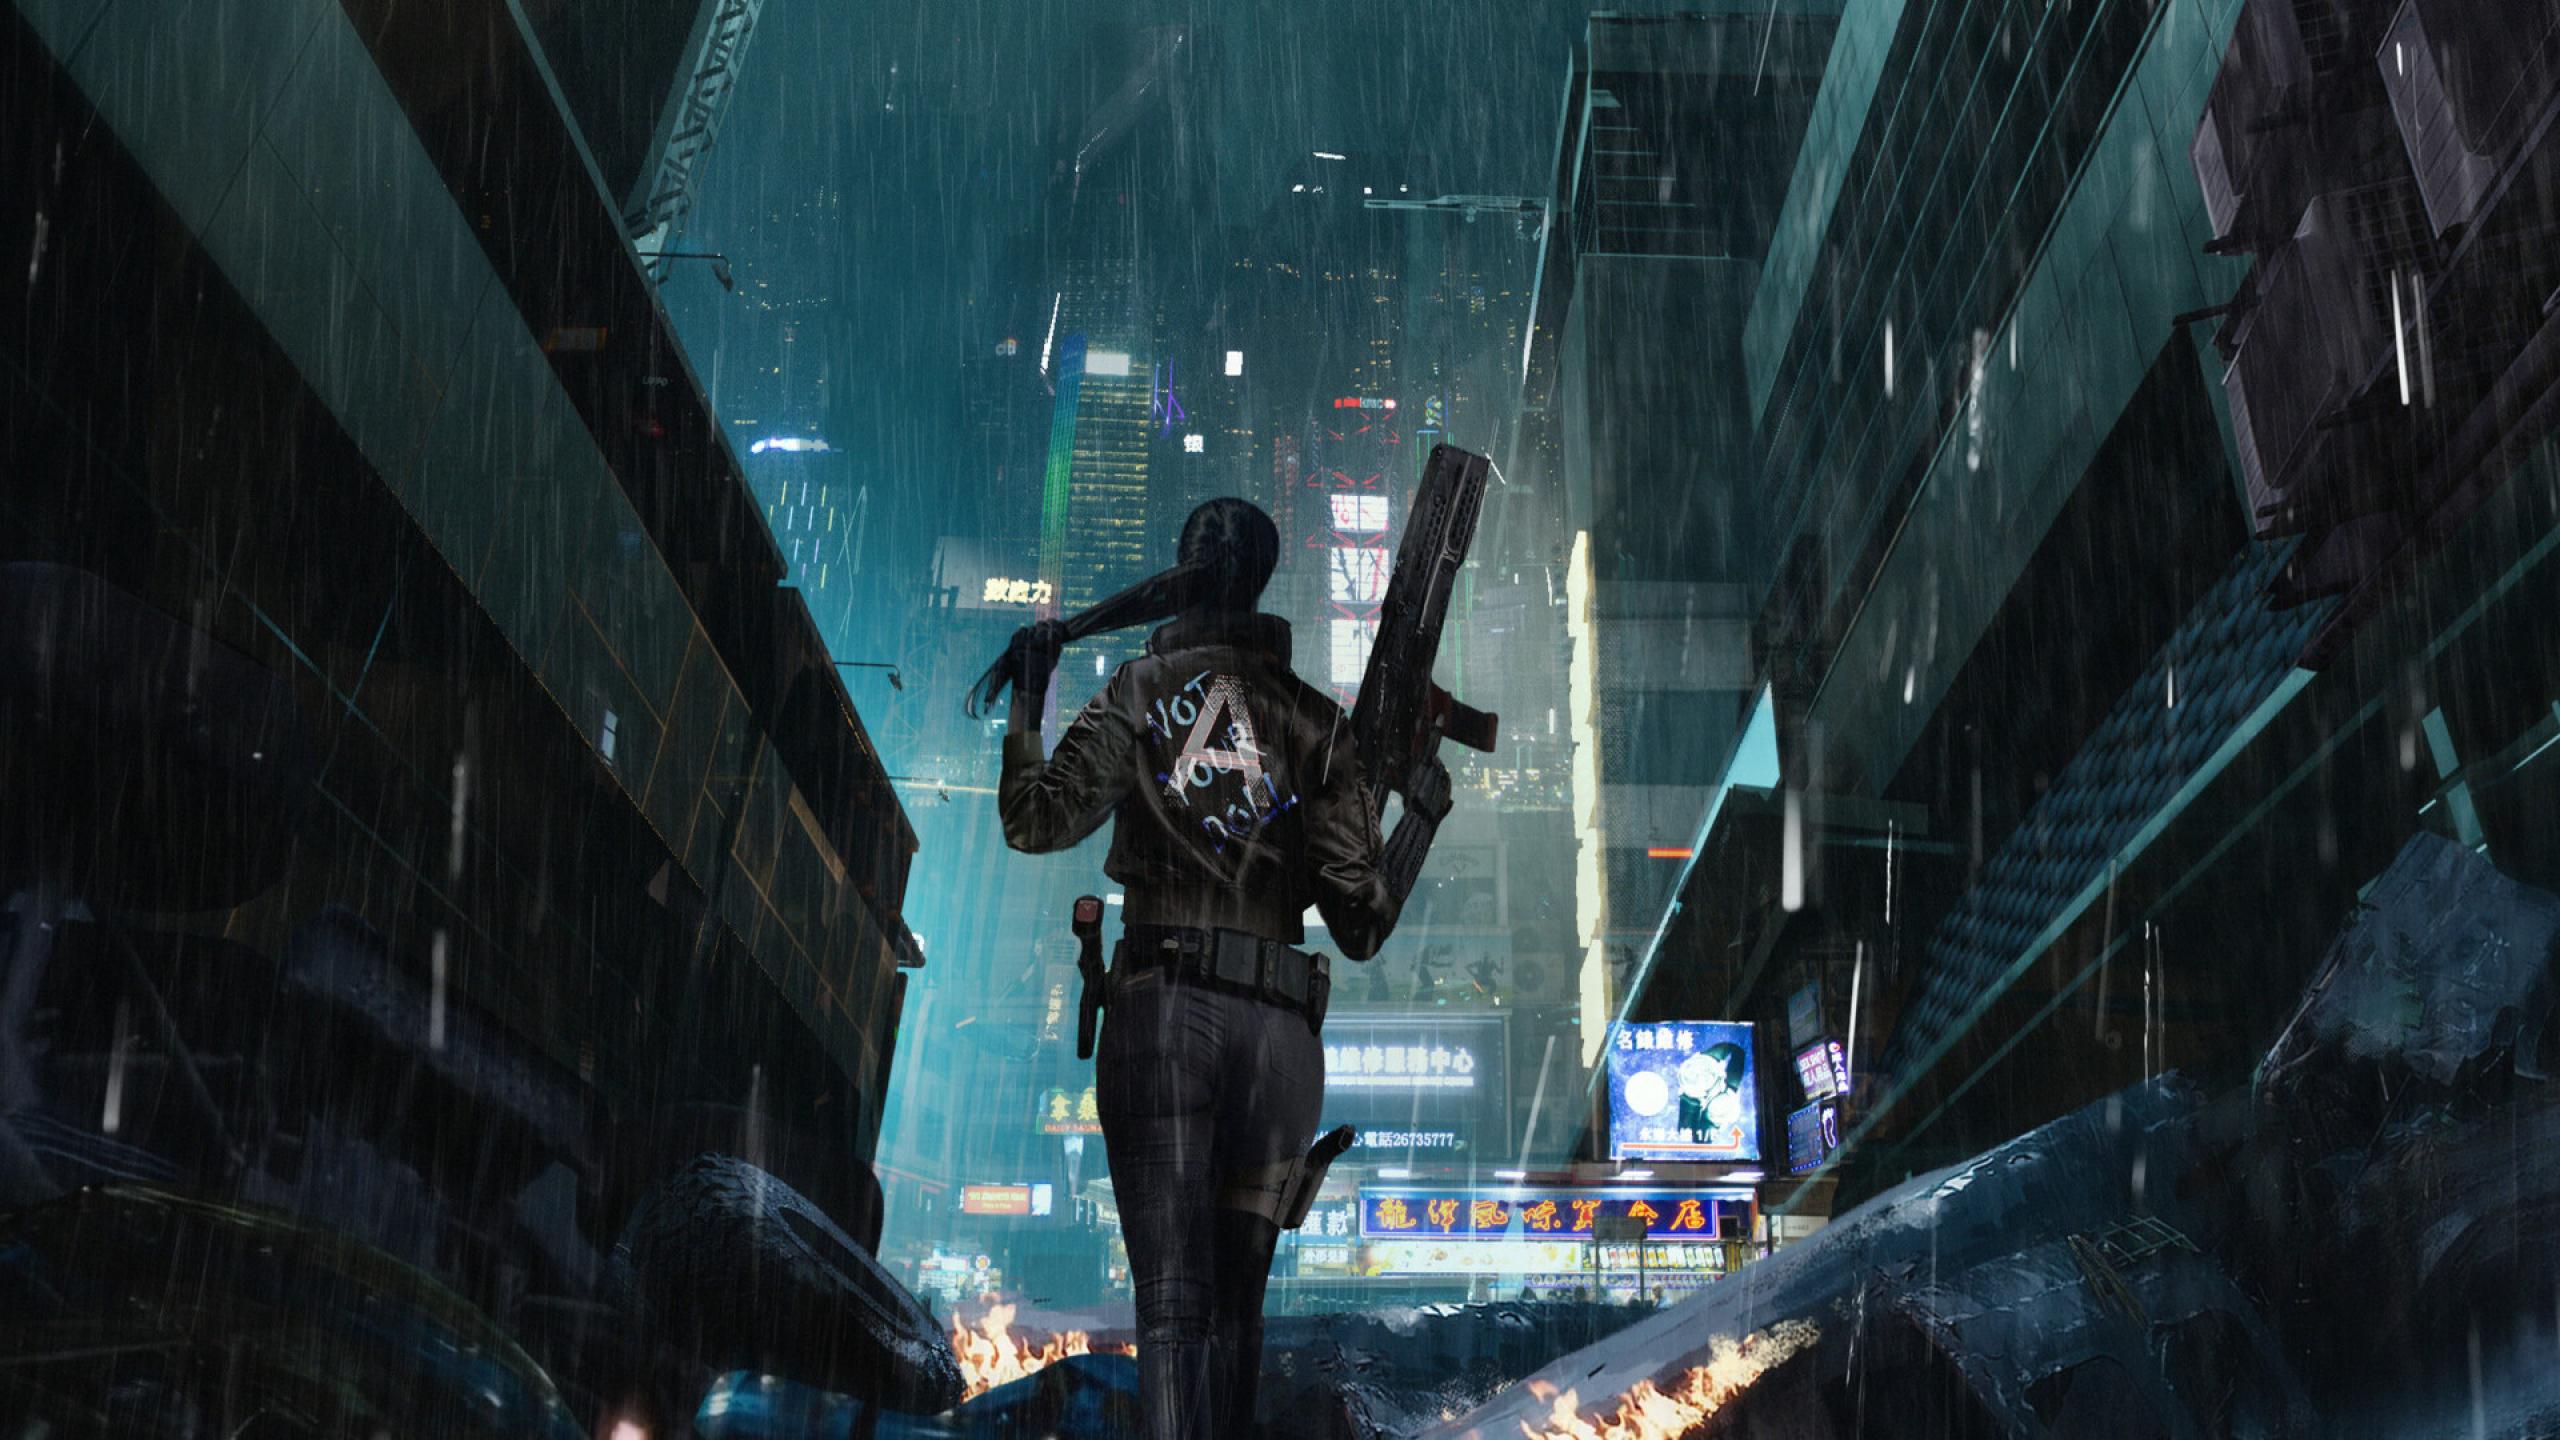 2560x1440 Cyberpunk Girl In Rain 1440P Resolution ...